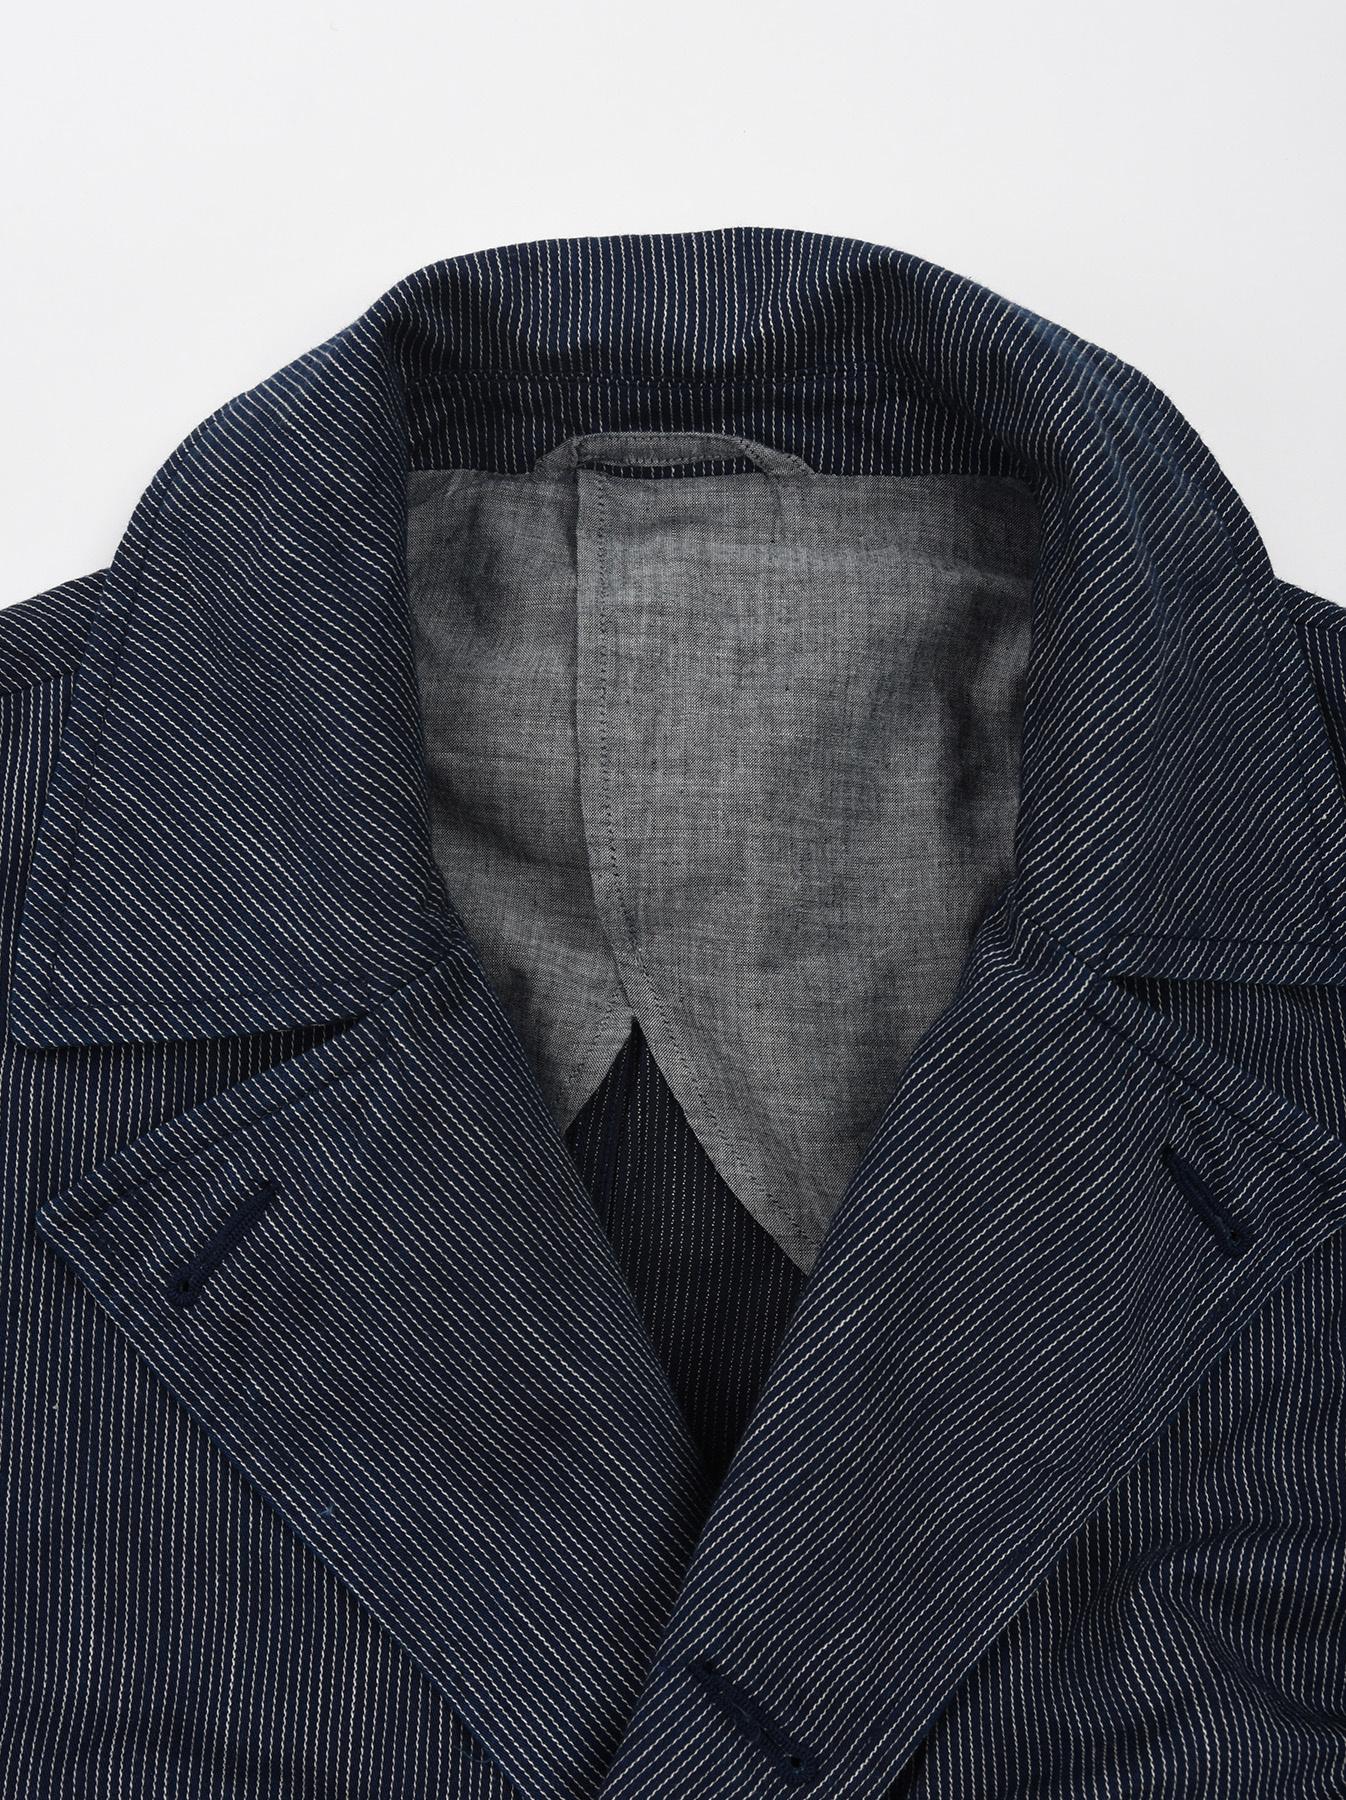 WH Indigo Mugi Yoko-shusi P-coat-7